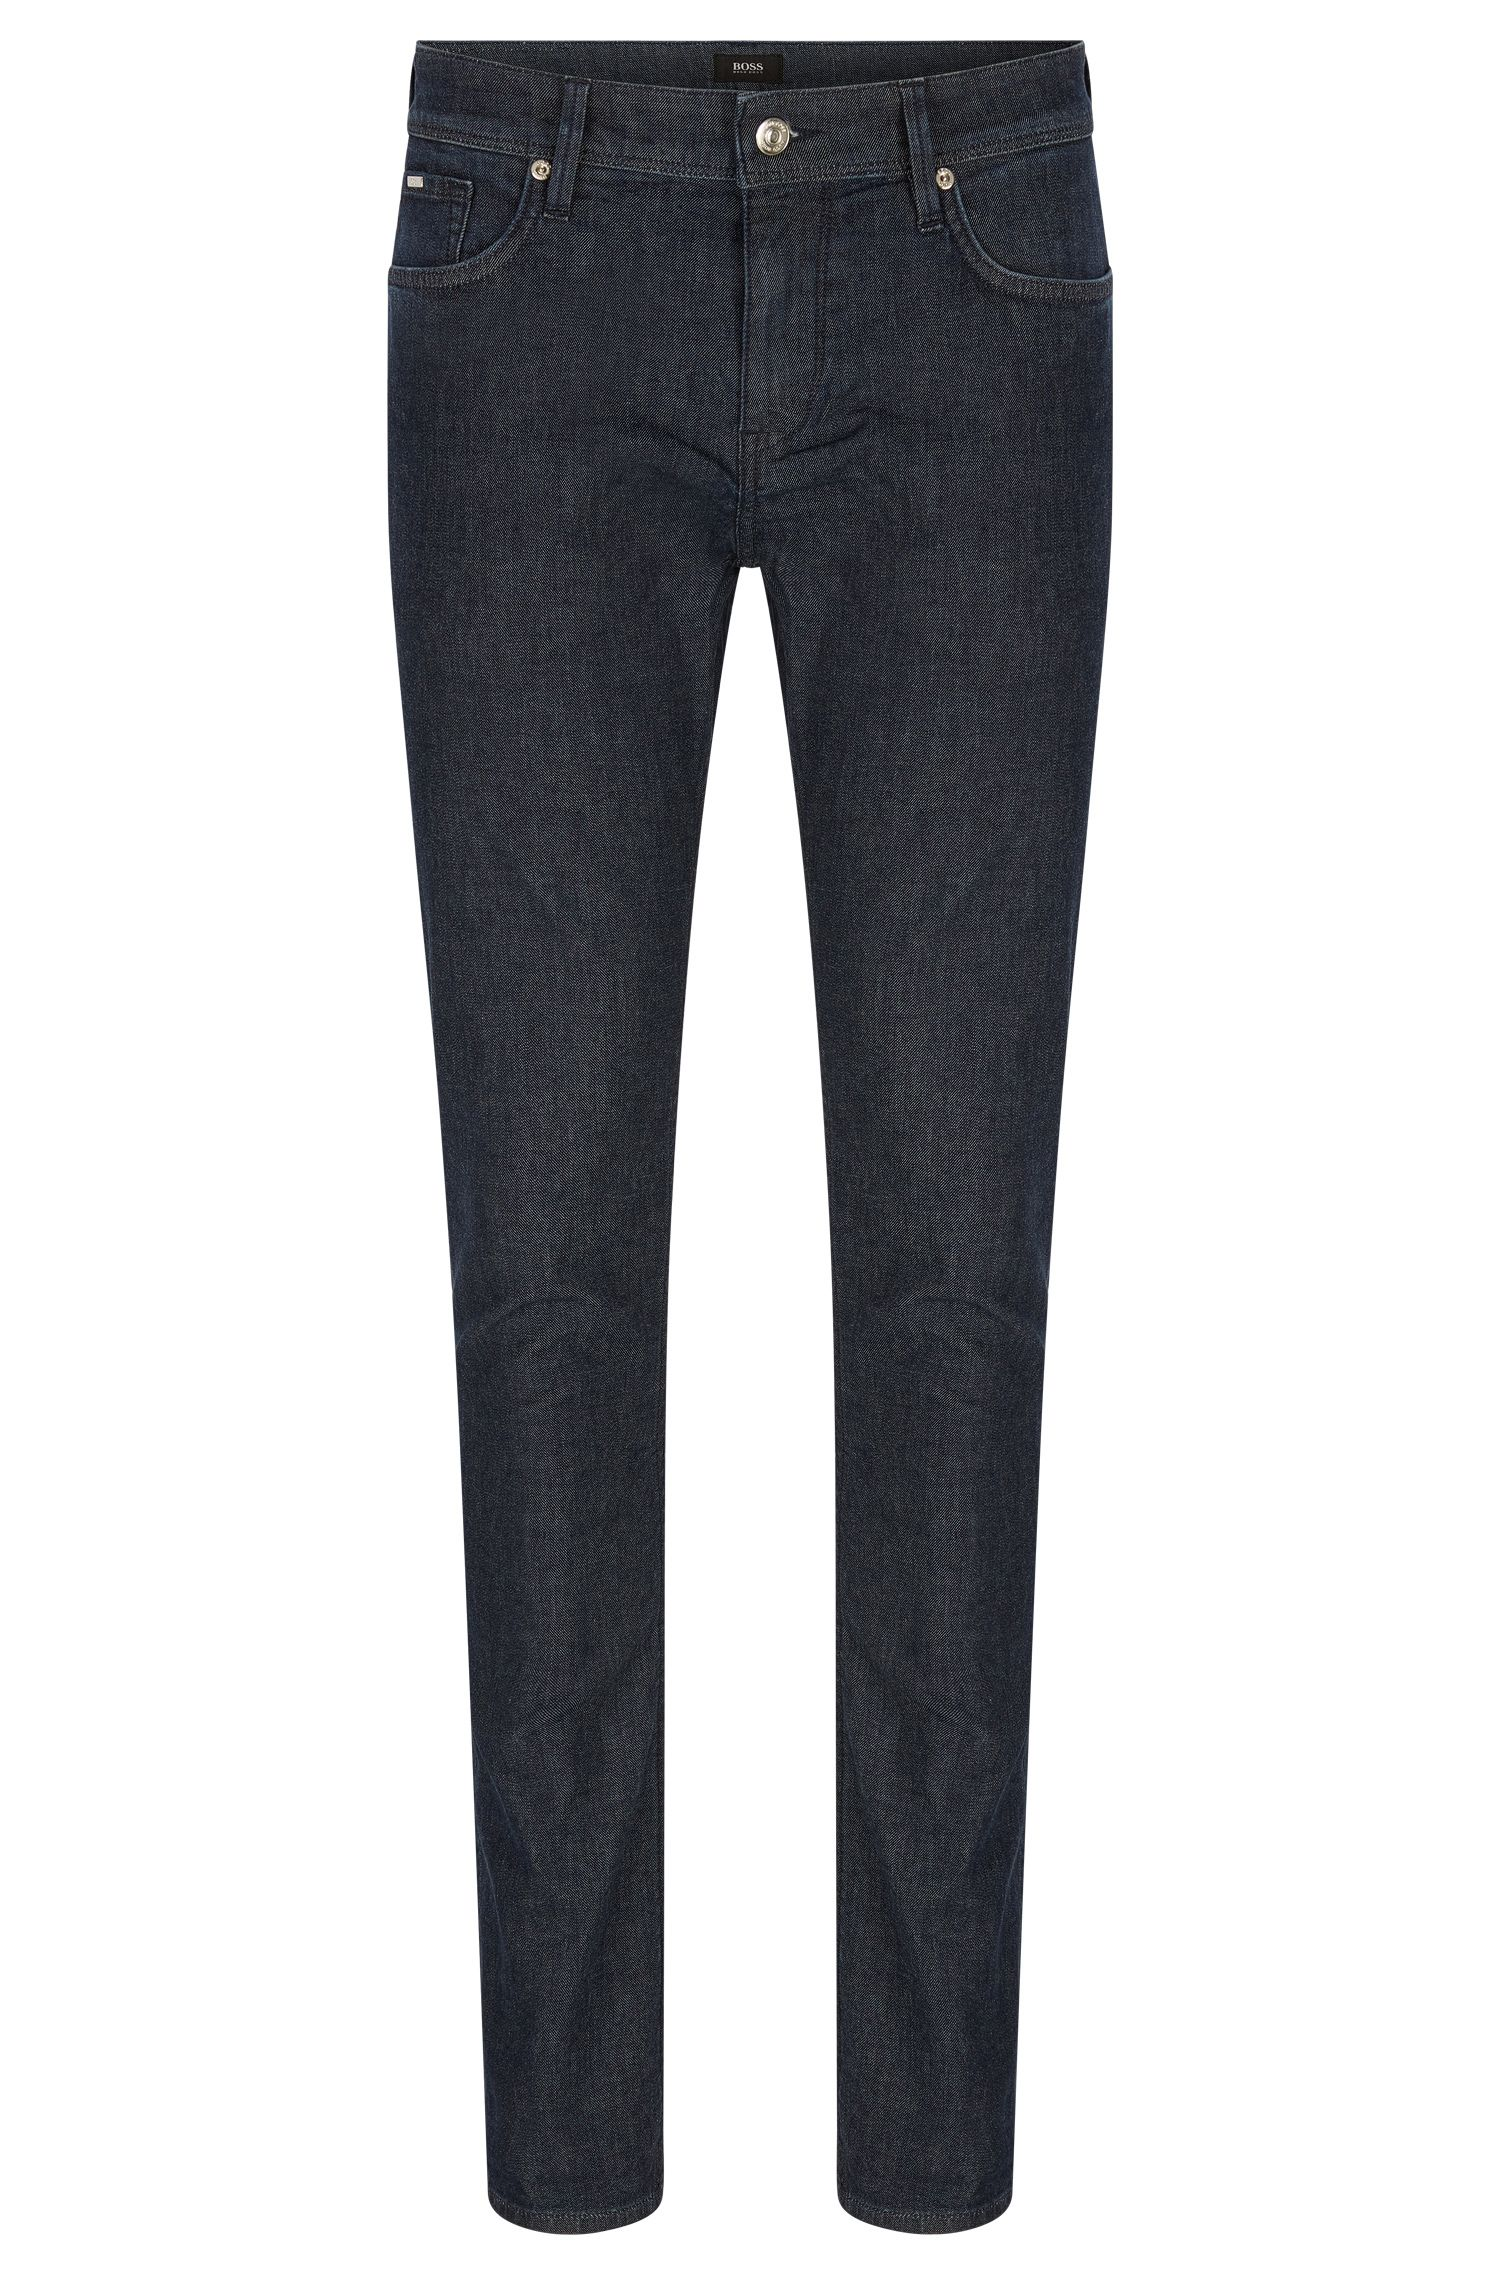 9 oz Stretch Cotton Pant,  Extra Slim Fit | Charleston